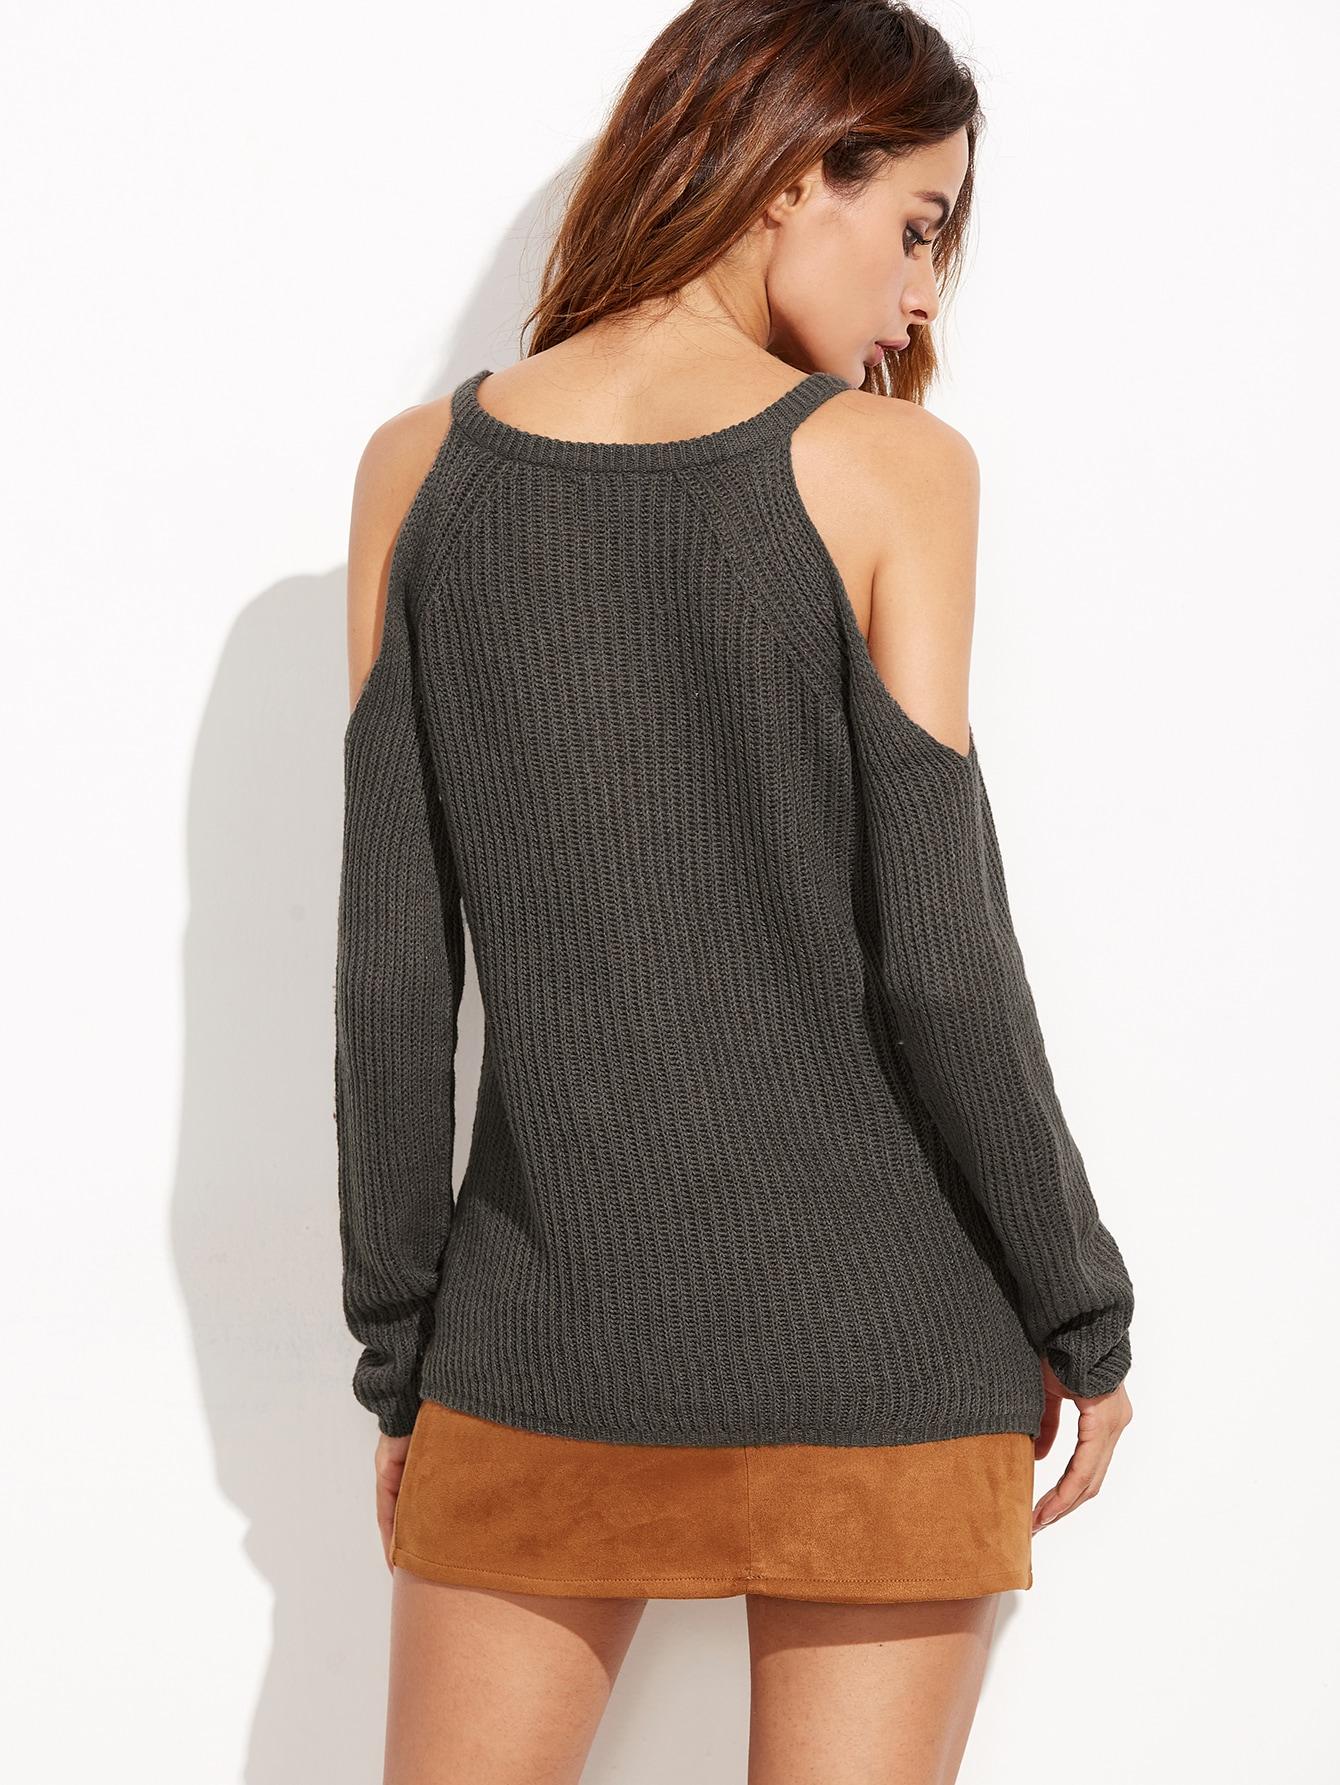 sweater160831452_2